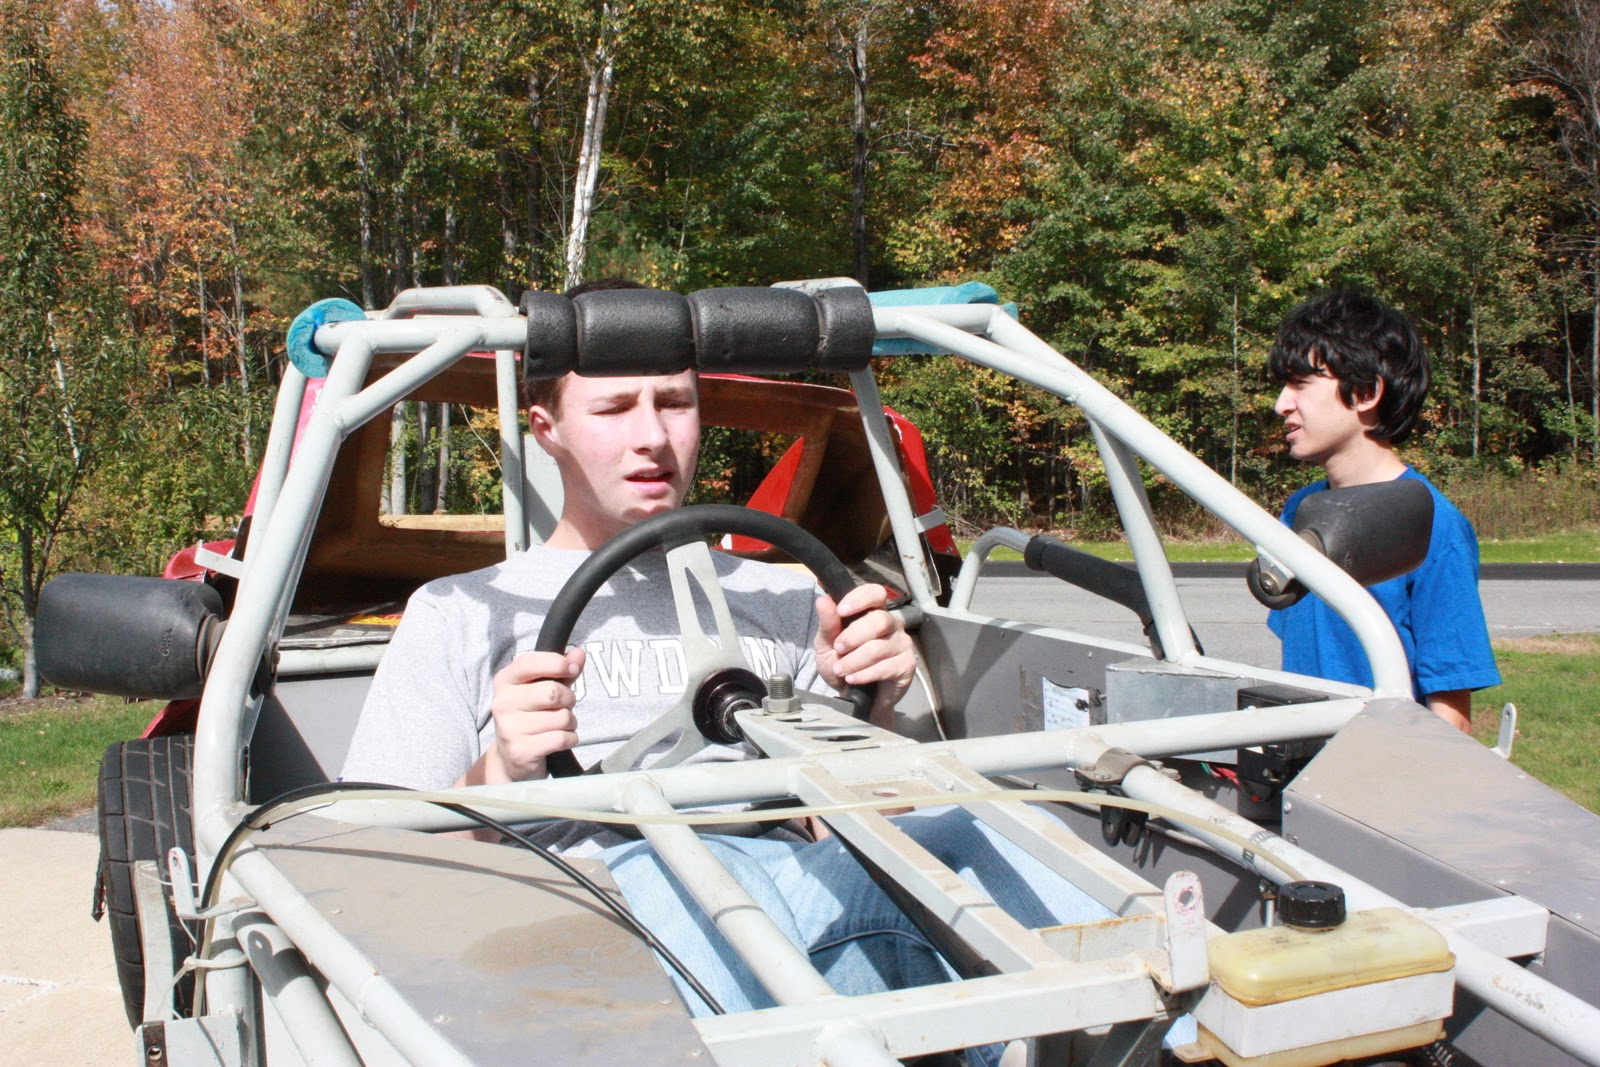 Bandolero Race Car: Advanced Topics In Engineering: November 2010